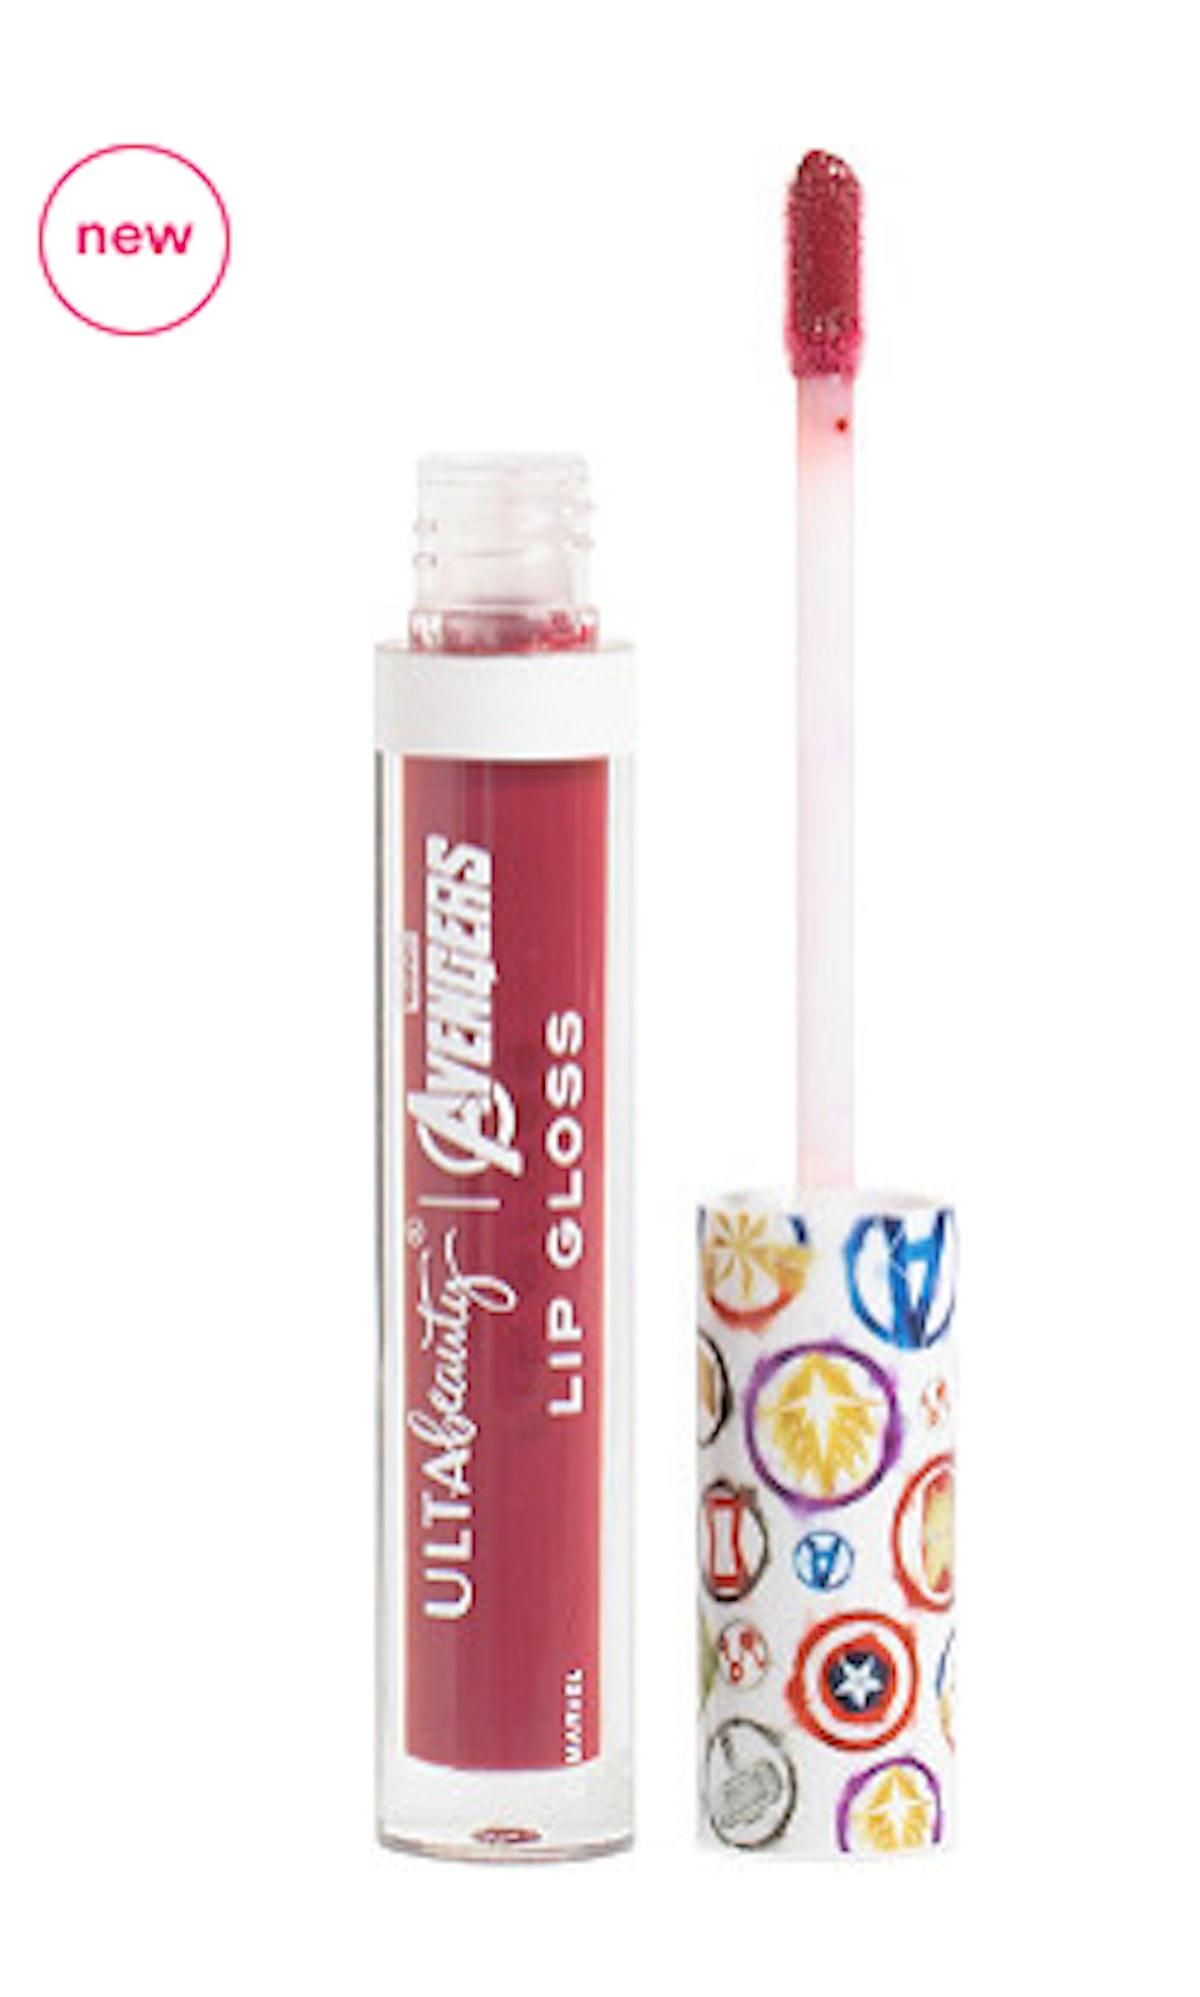 Ulta Beauty Collection x Marvel's Avengers Lip Gloss